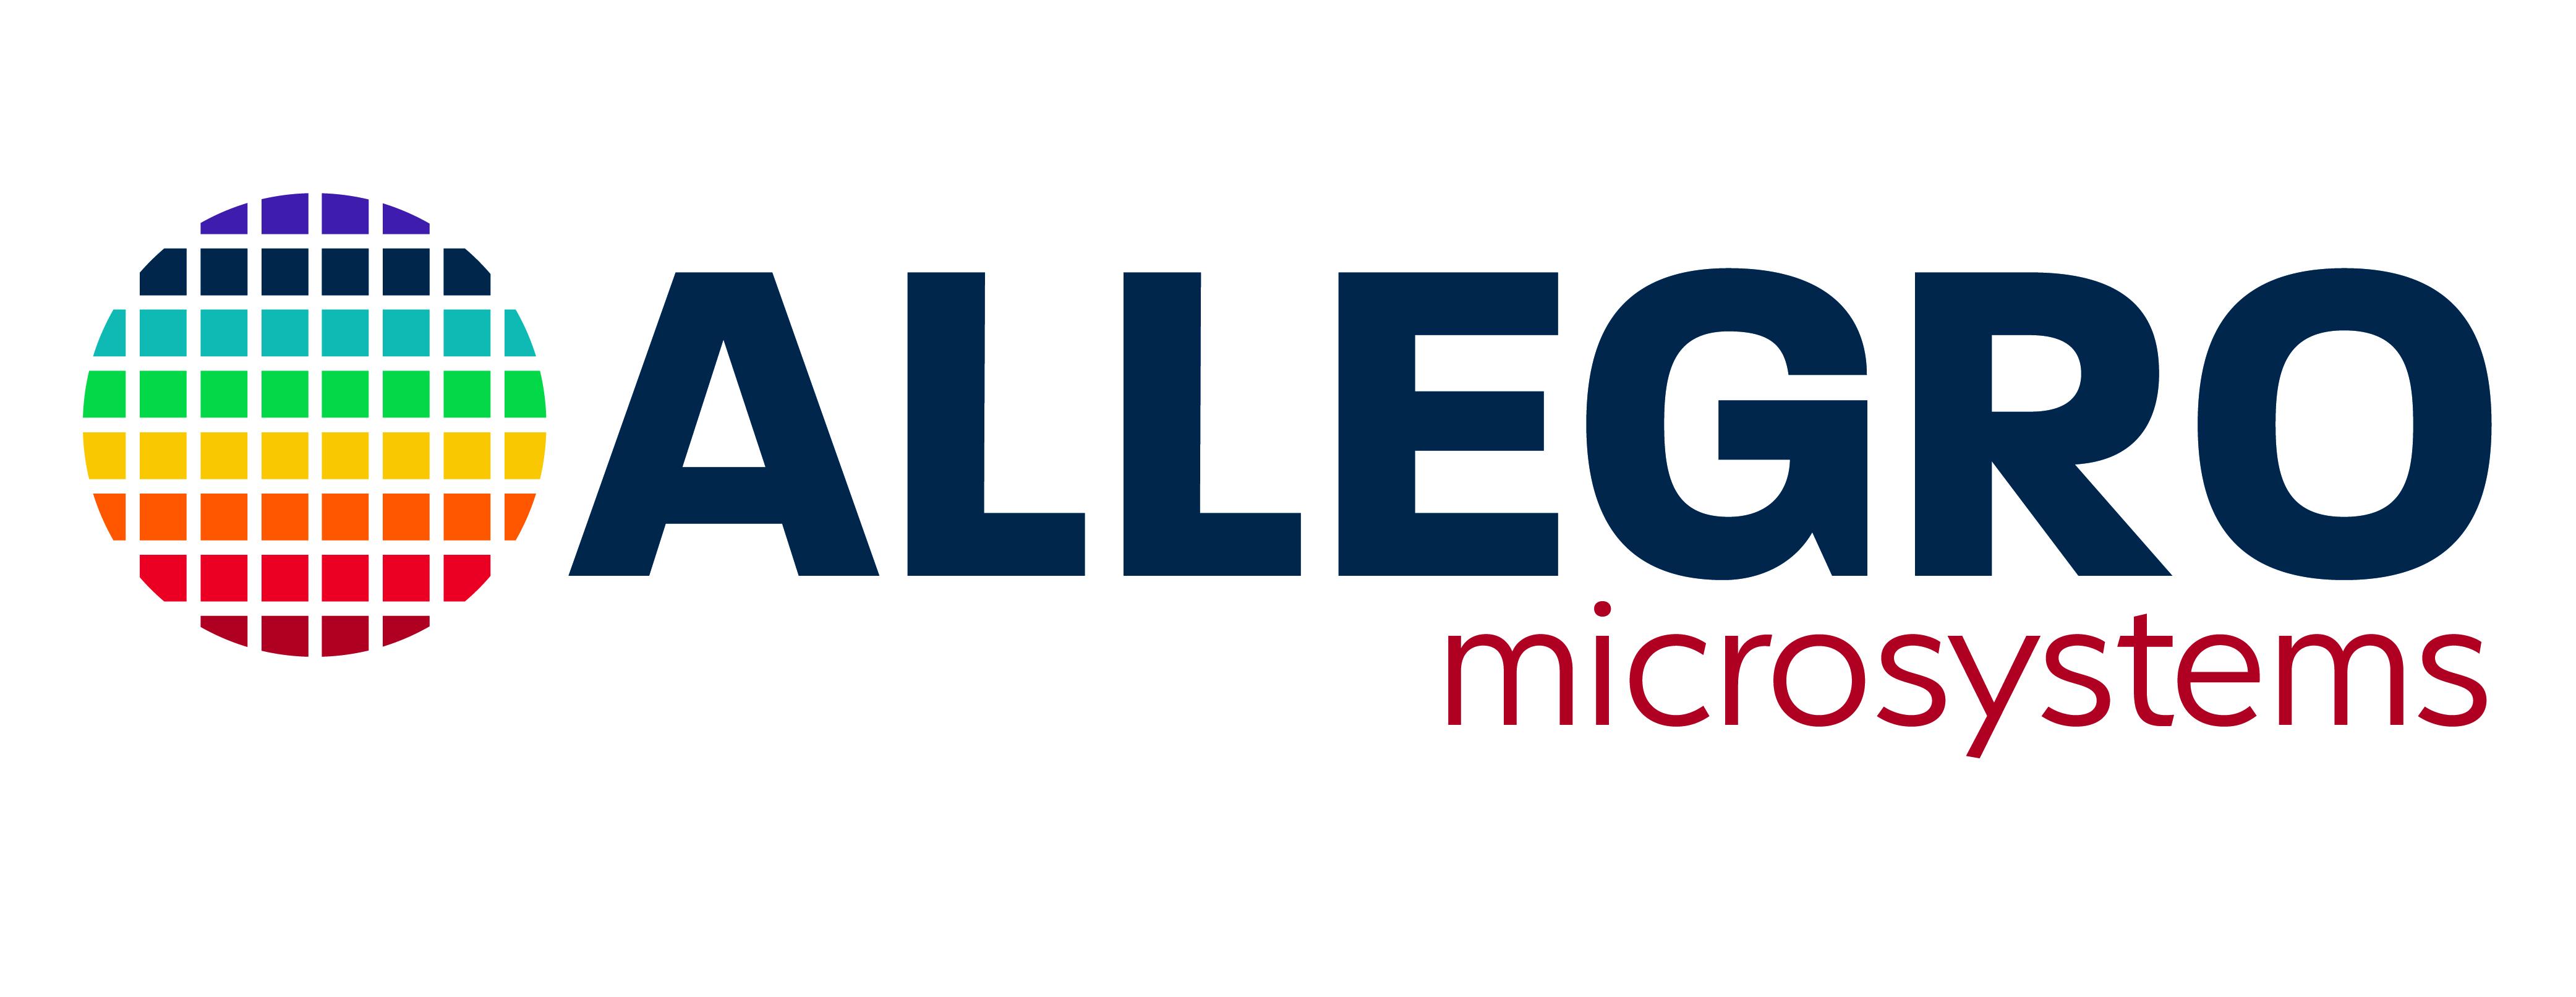 Allegro MicroSystems alt